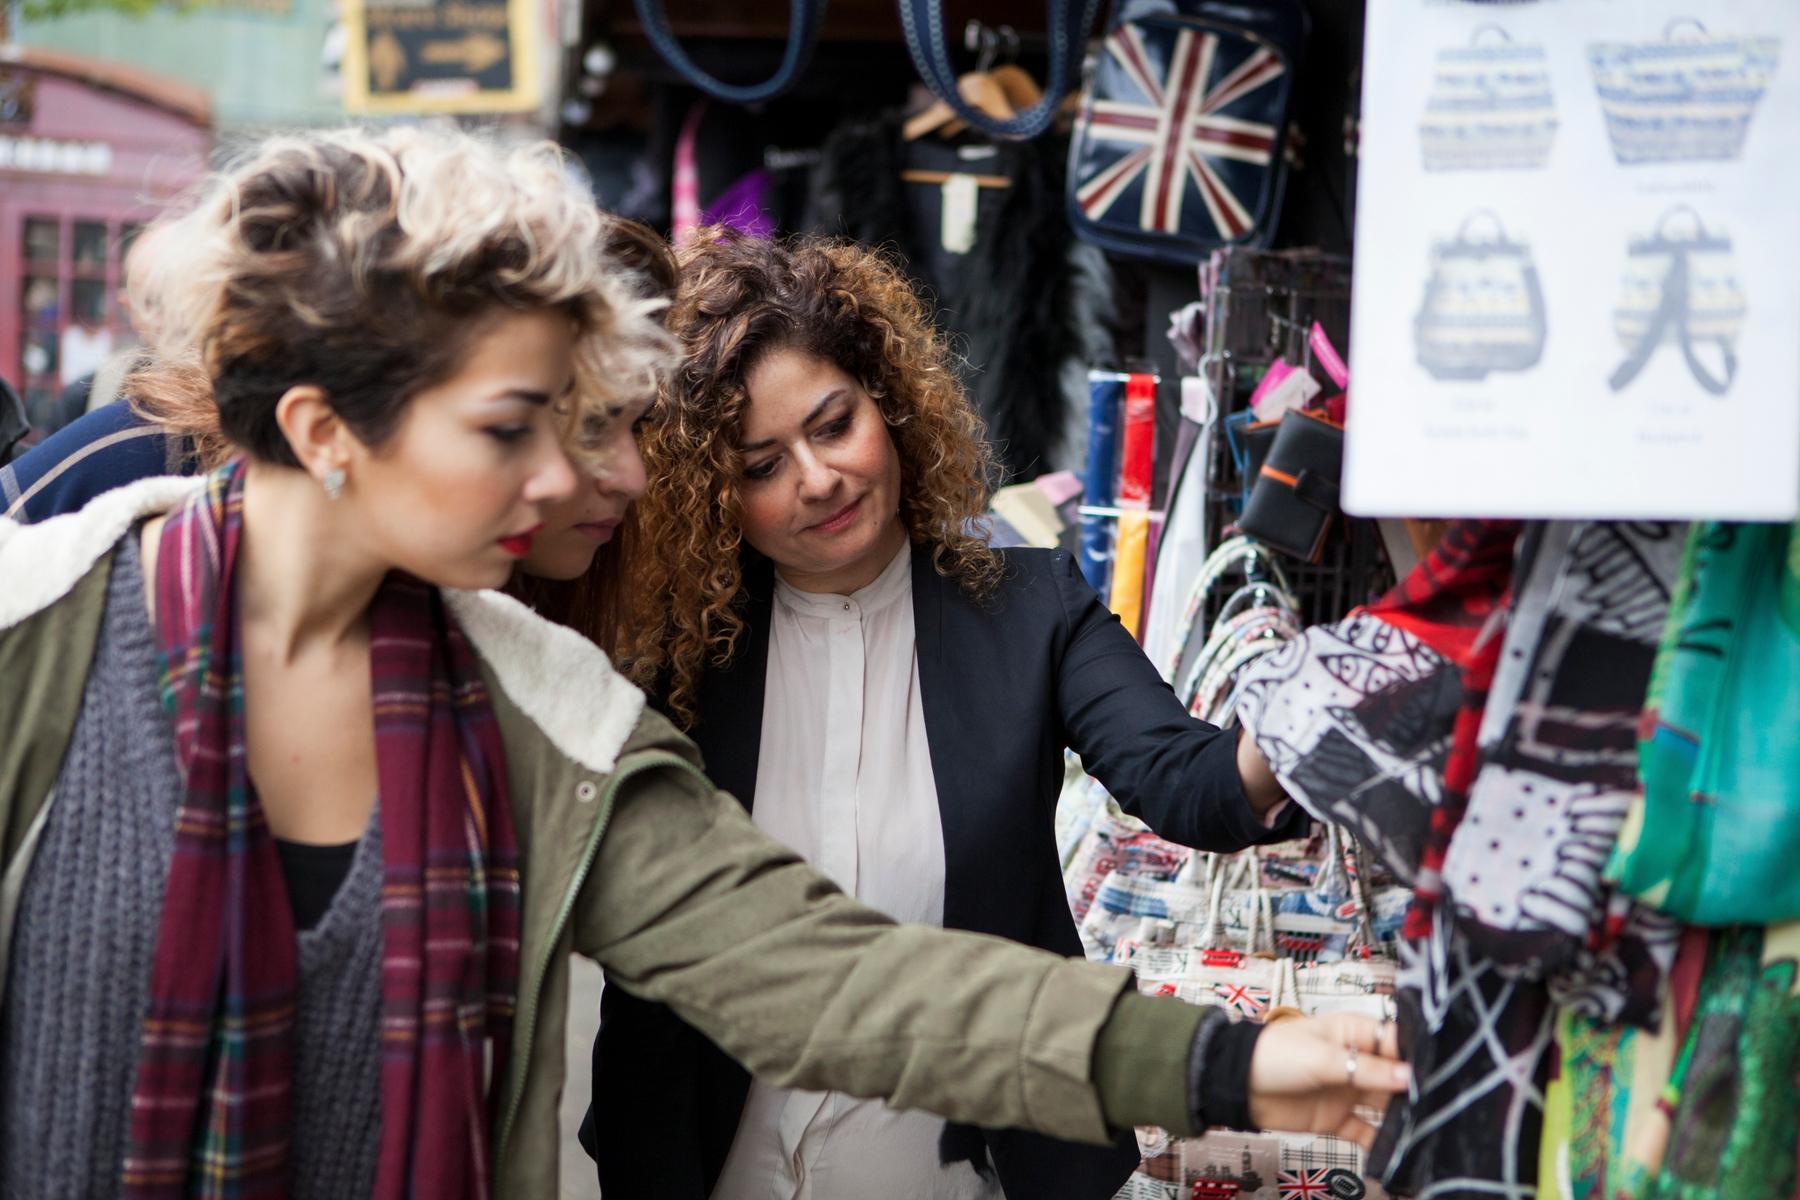 Find bargains at Camden Market London - לונדון